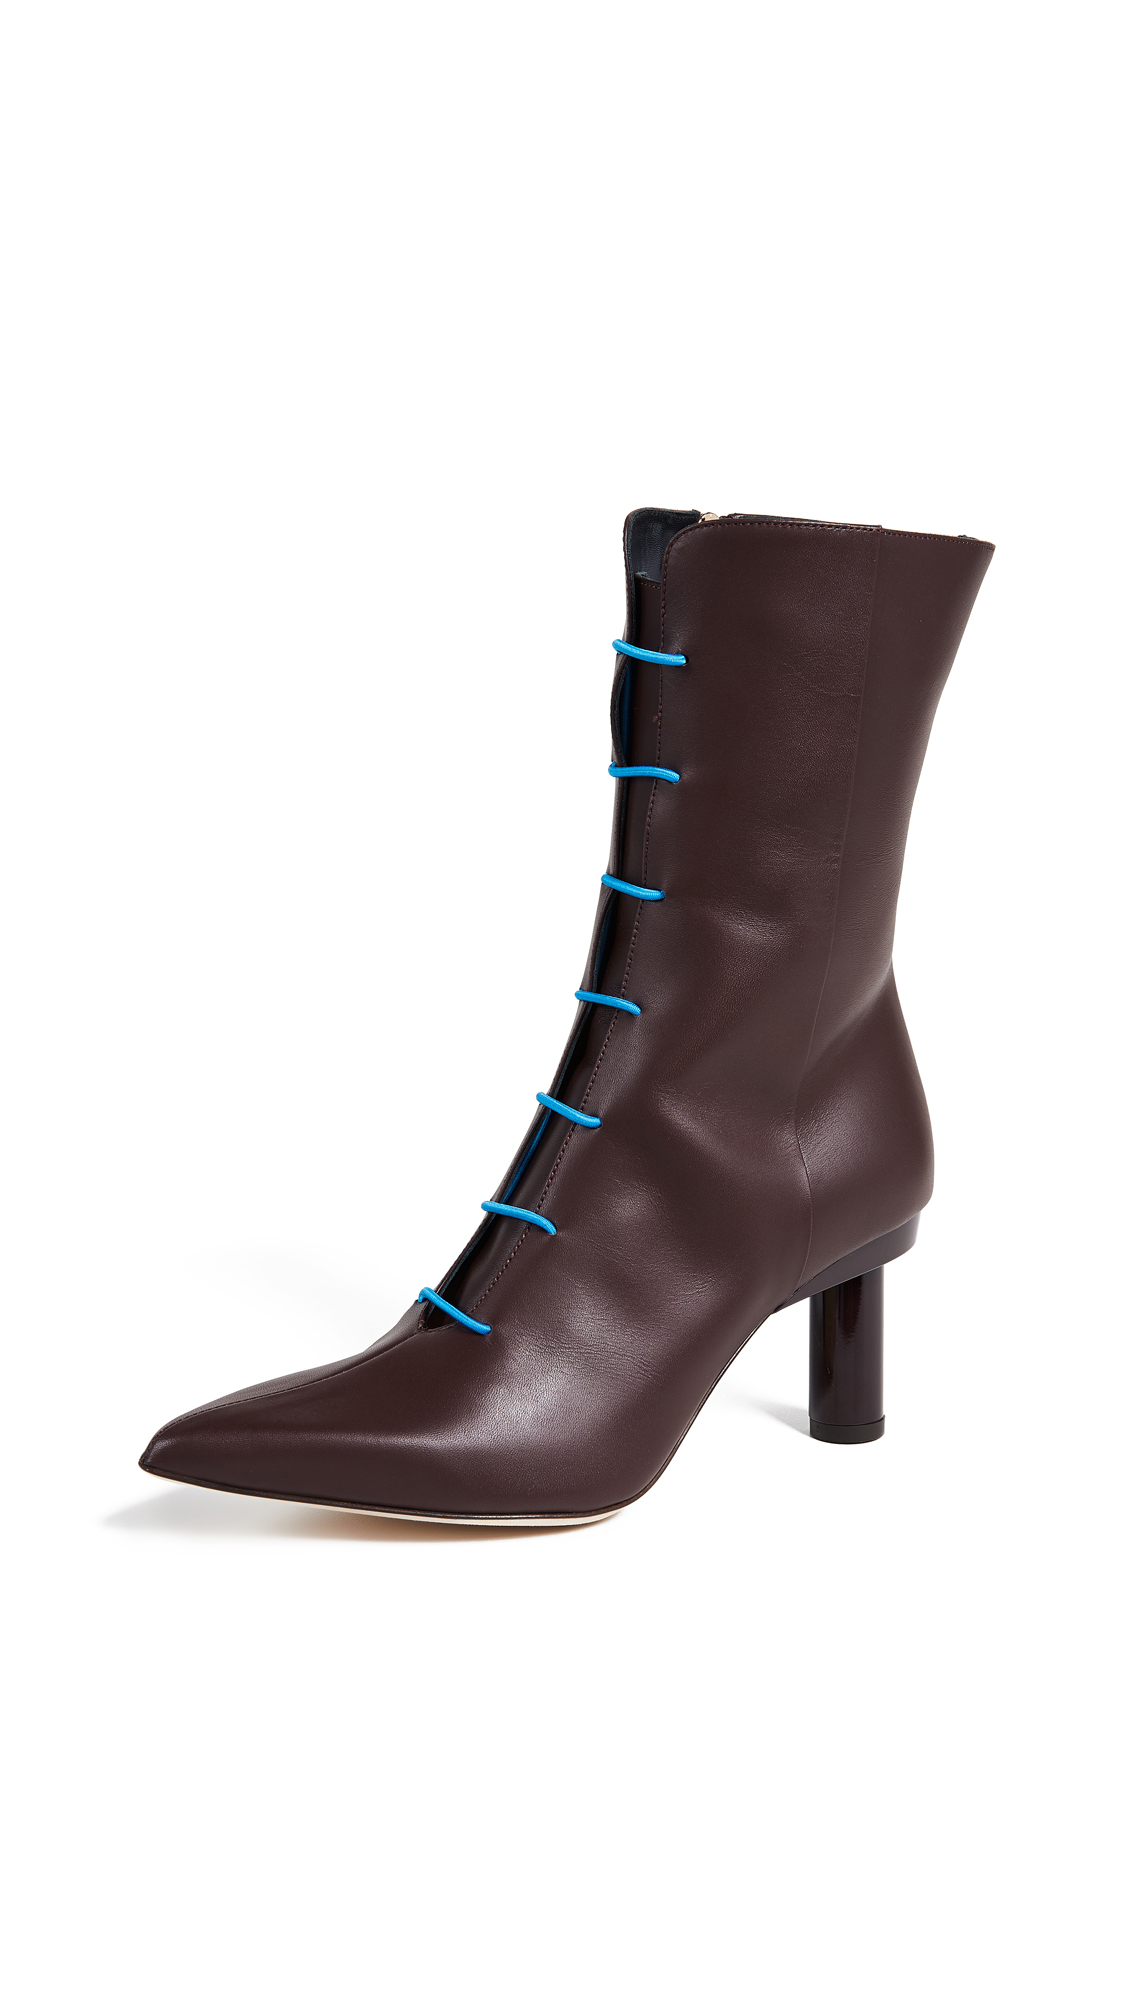 Tibi Adrian Boots - Burgundy/Blue Multi